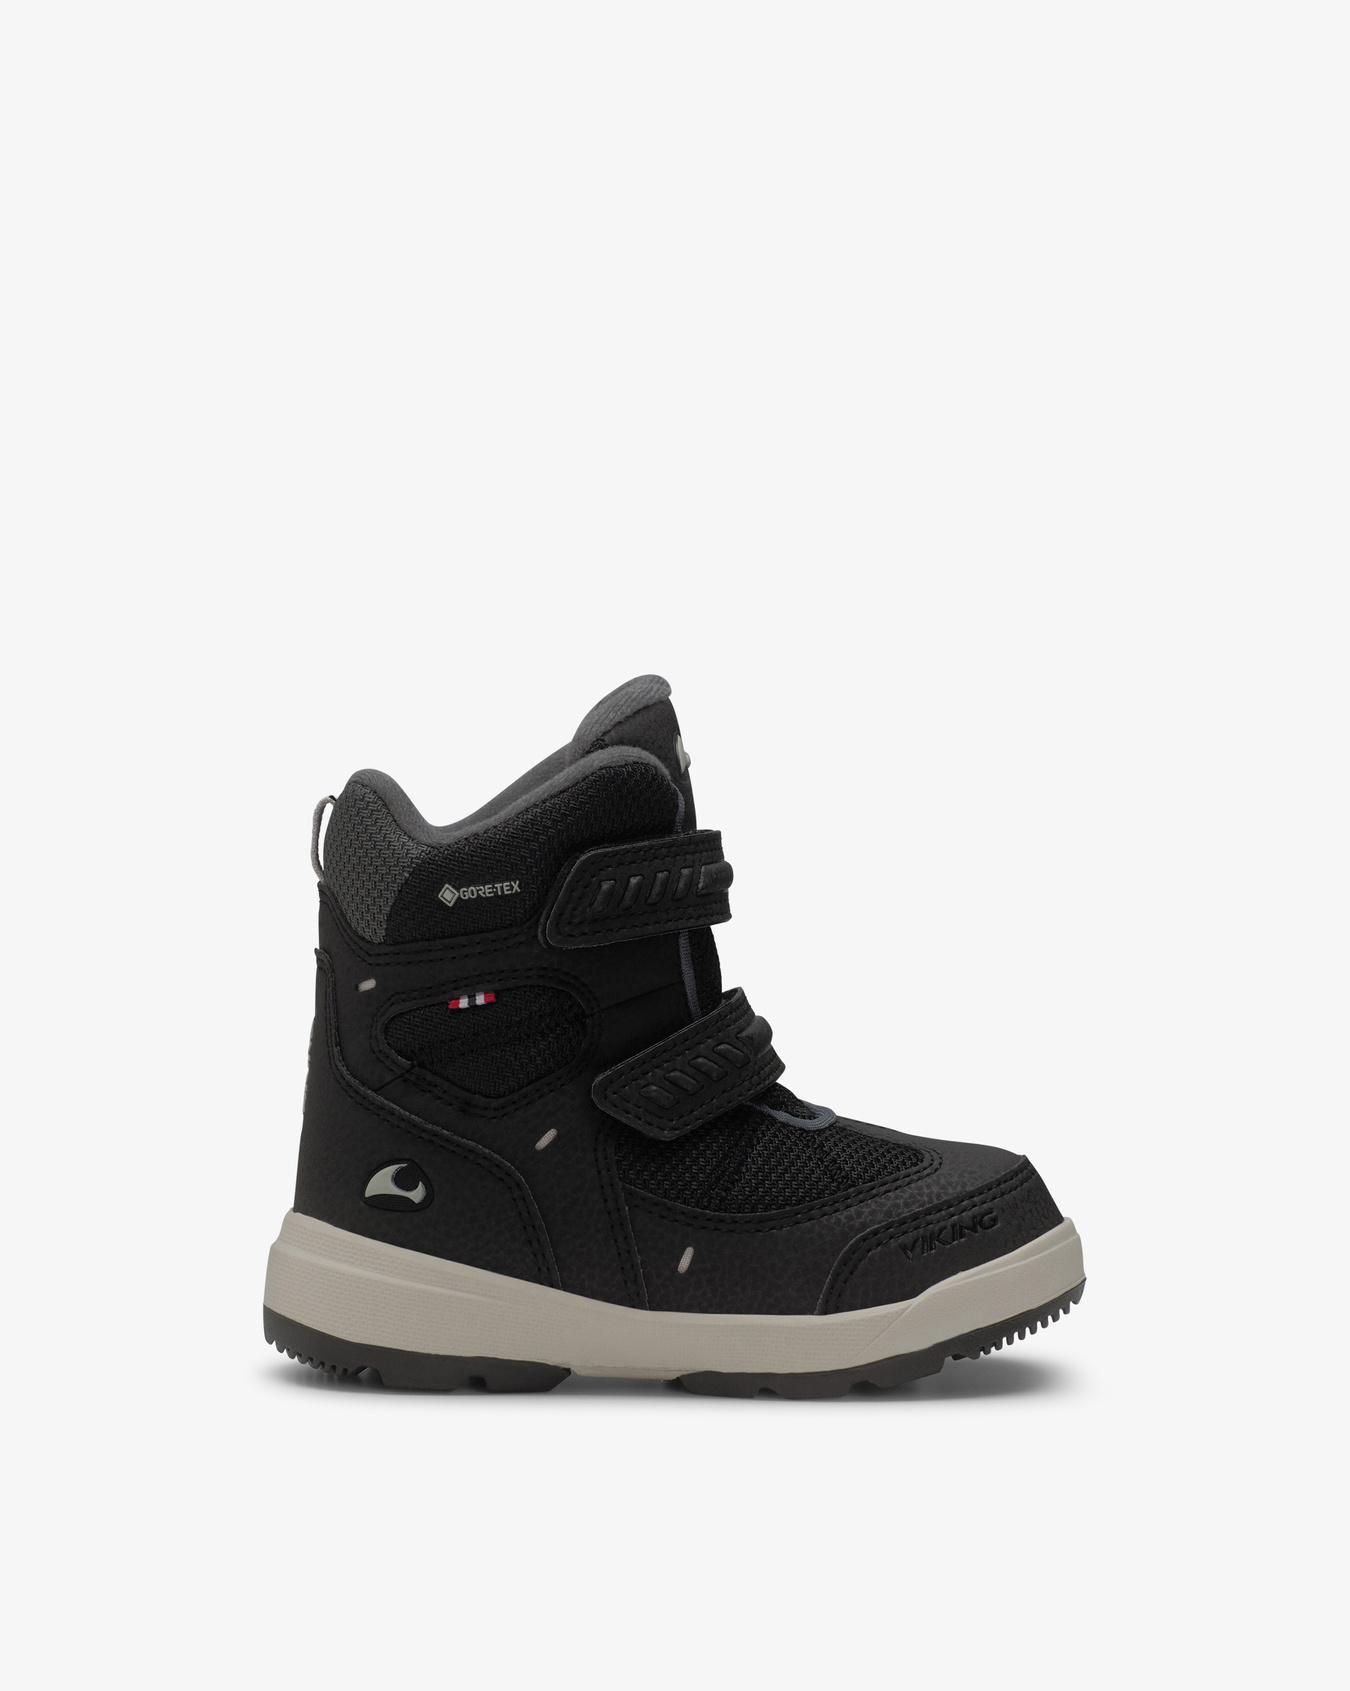 Toasty II GTX Black Winter Boots